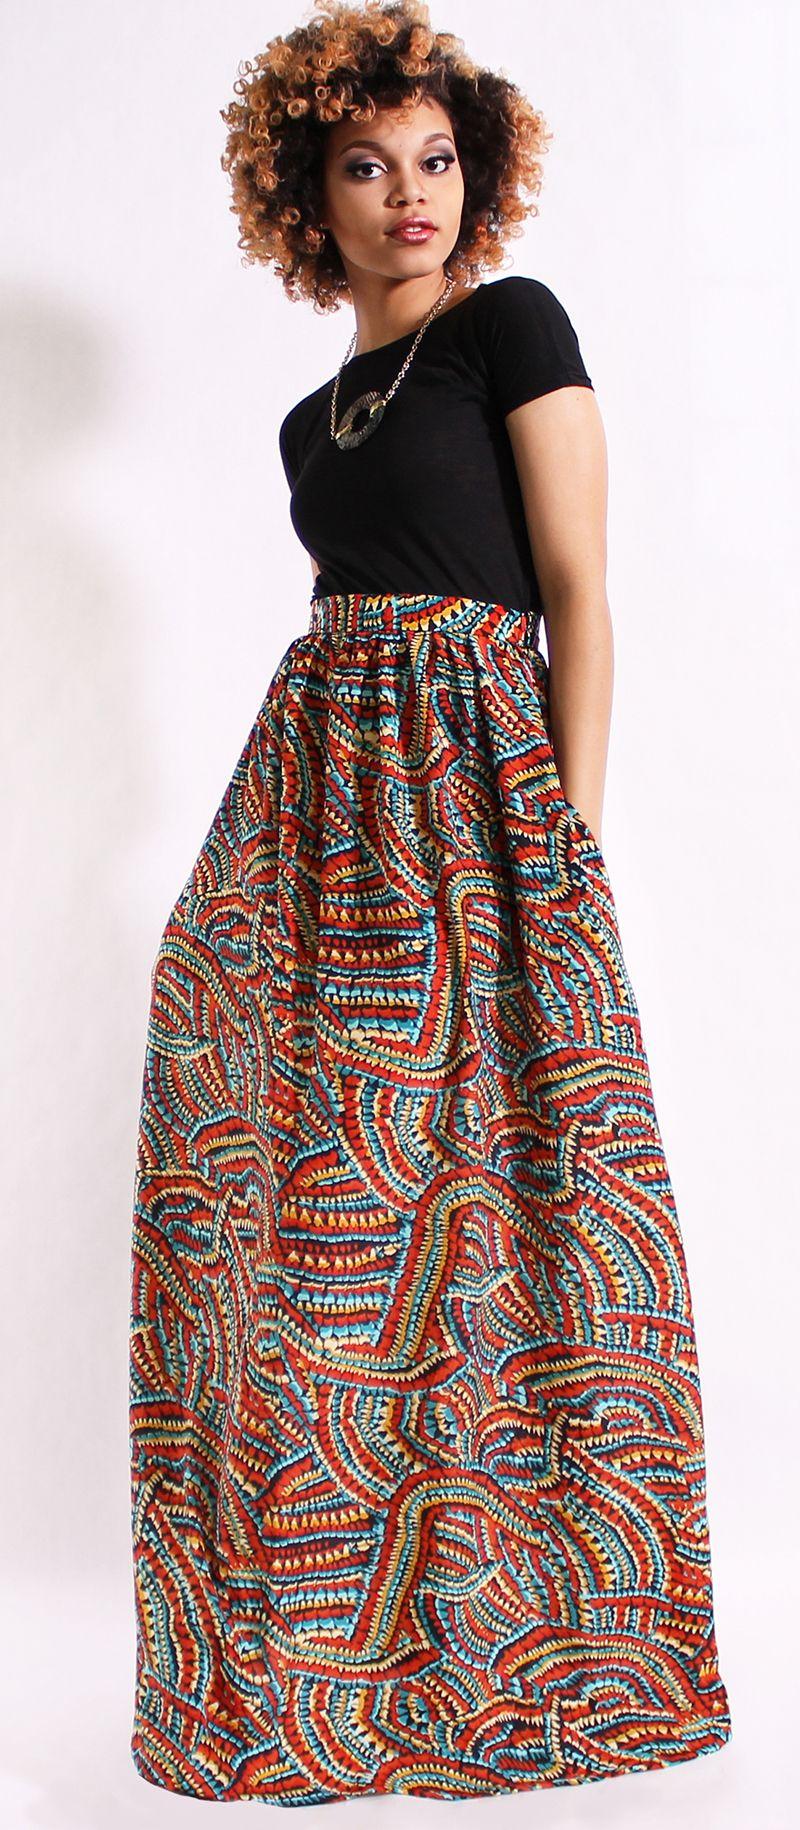 DIMILOC- Printed Maxi Skirt w/ Pockets #modest #maxiskirts #skirts #modestfashion